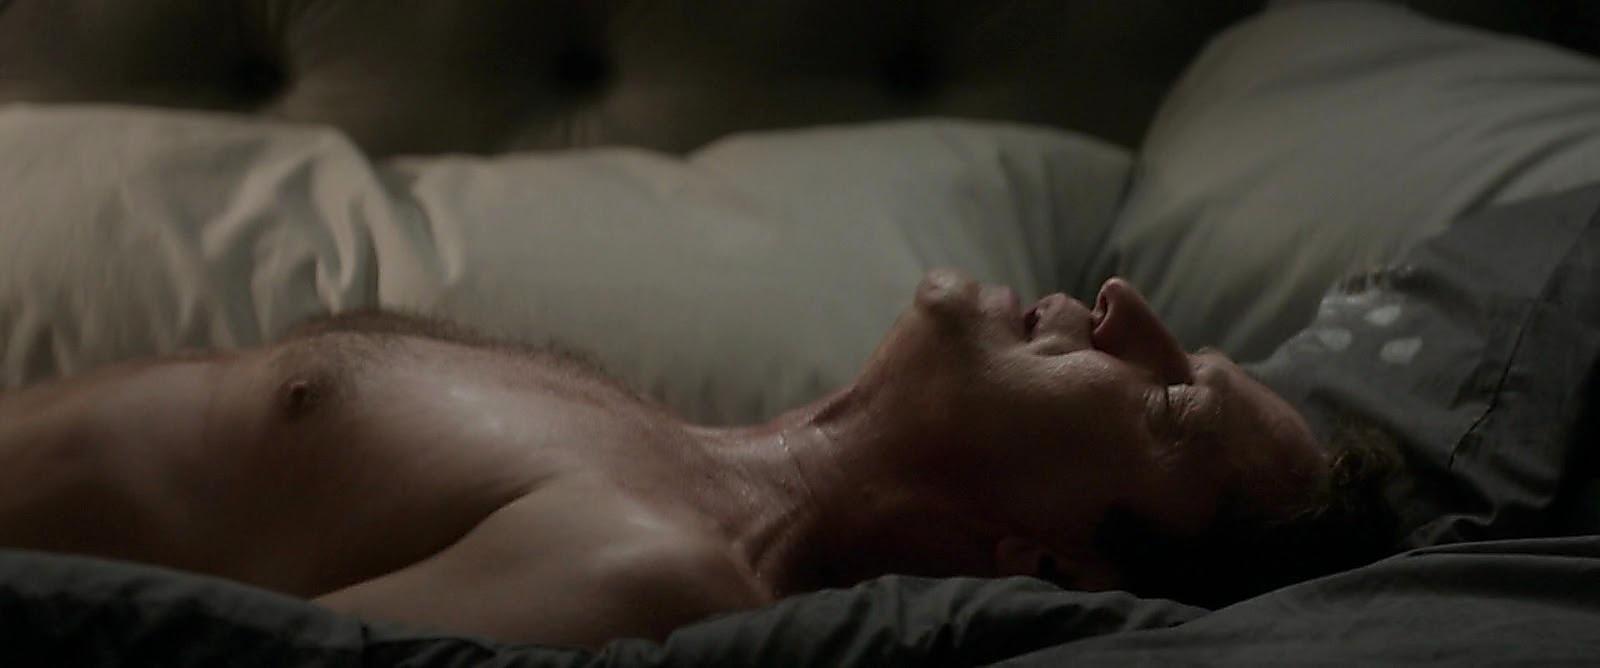 Gerard Butler sexy shirtless scene June 5, 2017, 1pm